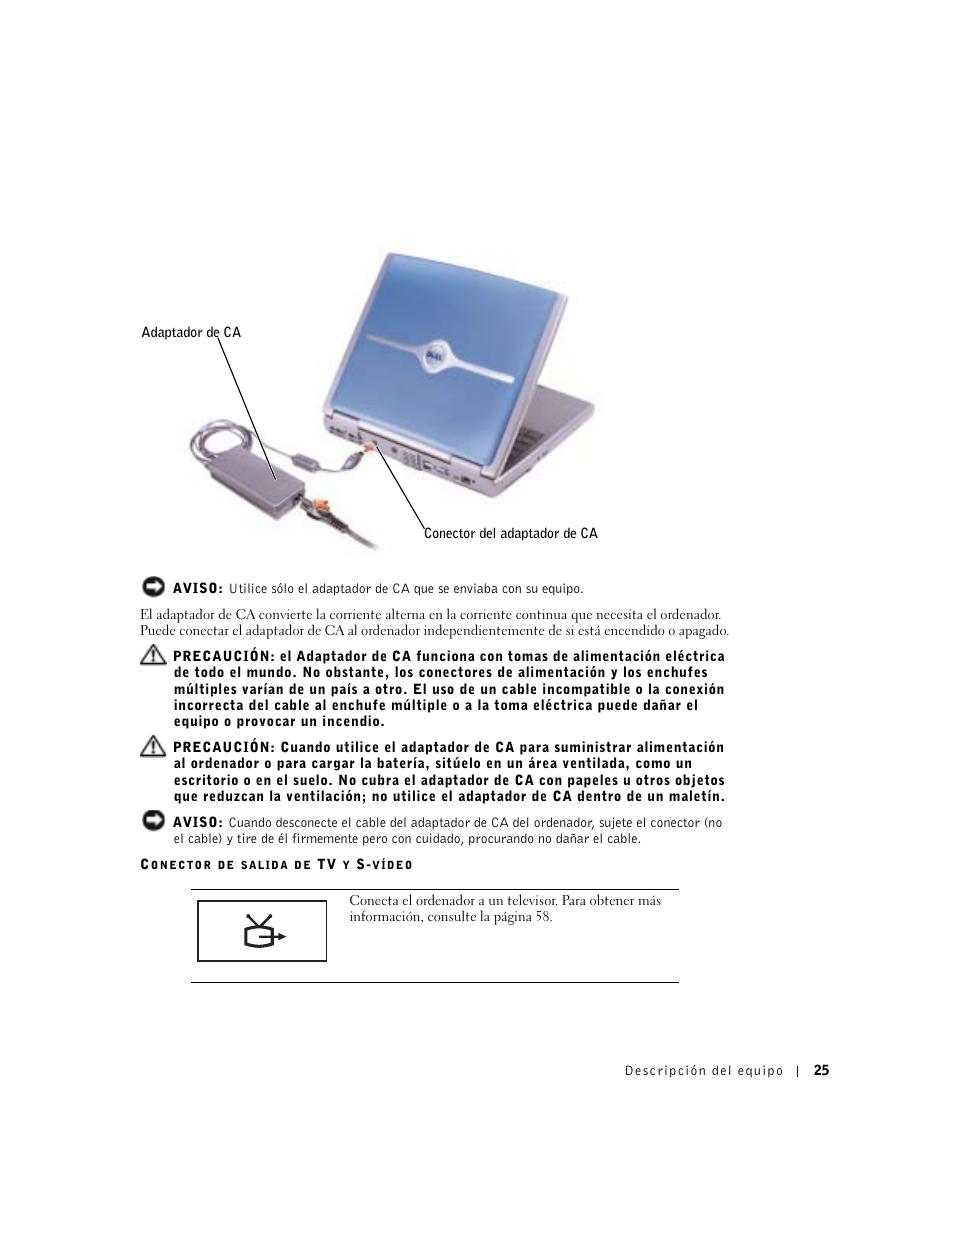 dell inspiron 5100 manual del usuario p gina 25 154 original rh pdfmanuales com dell inspiron 5100 manual pdf Dell Inspiron 5100 Charger